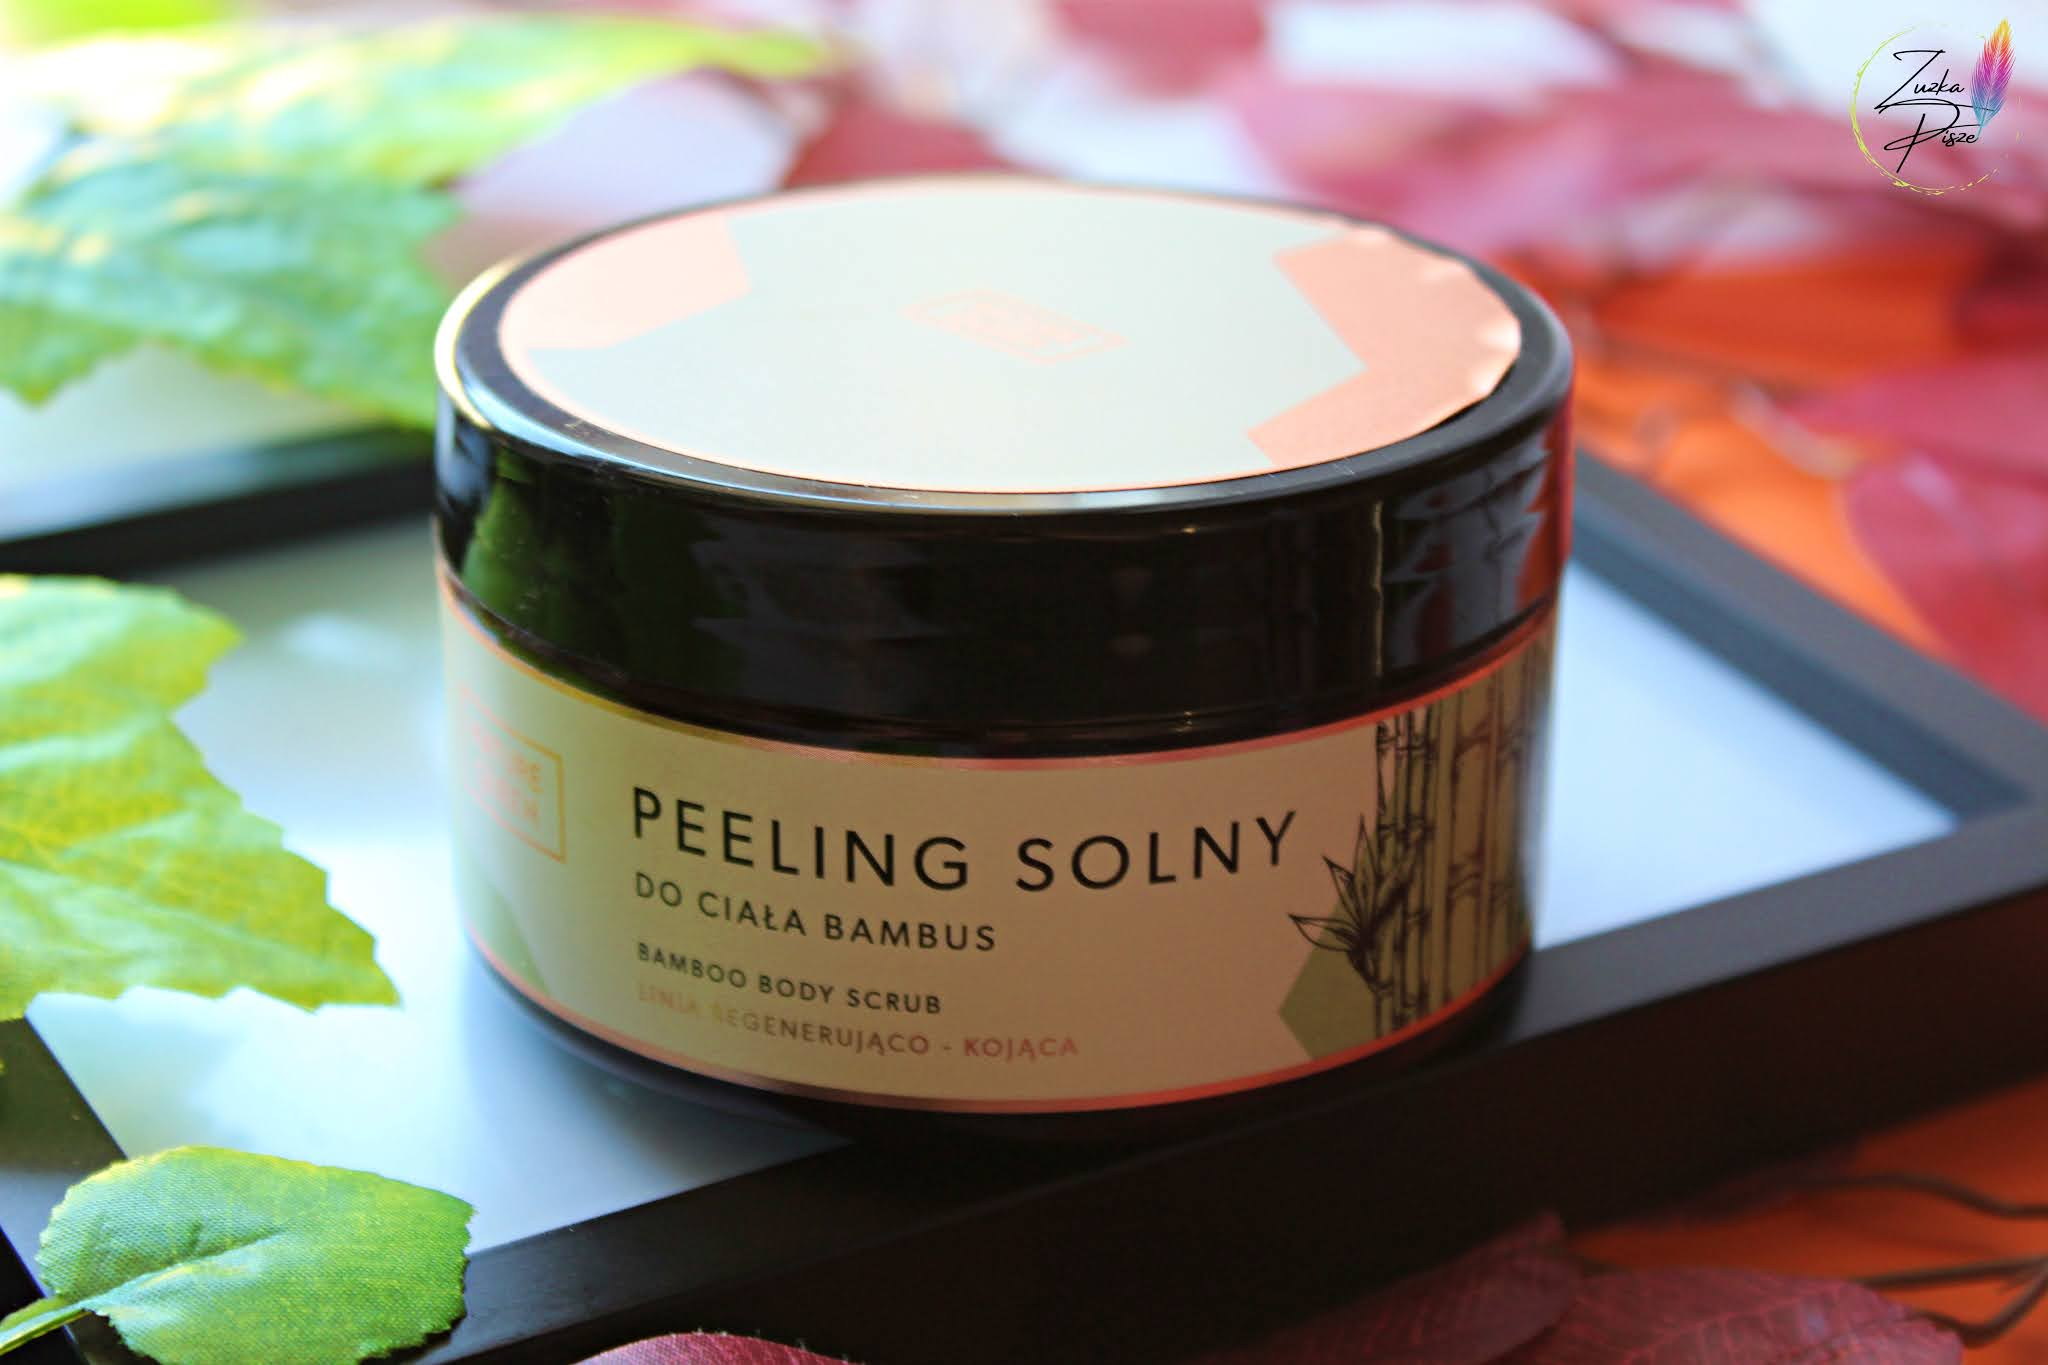 Peeling solny do ciała Bambus - Nature Queen